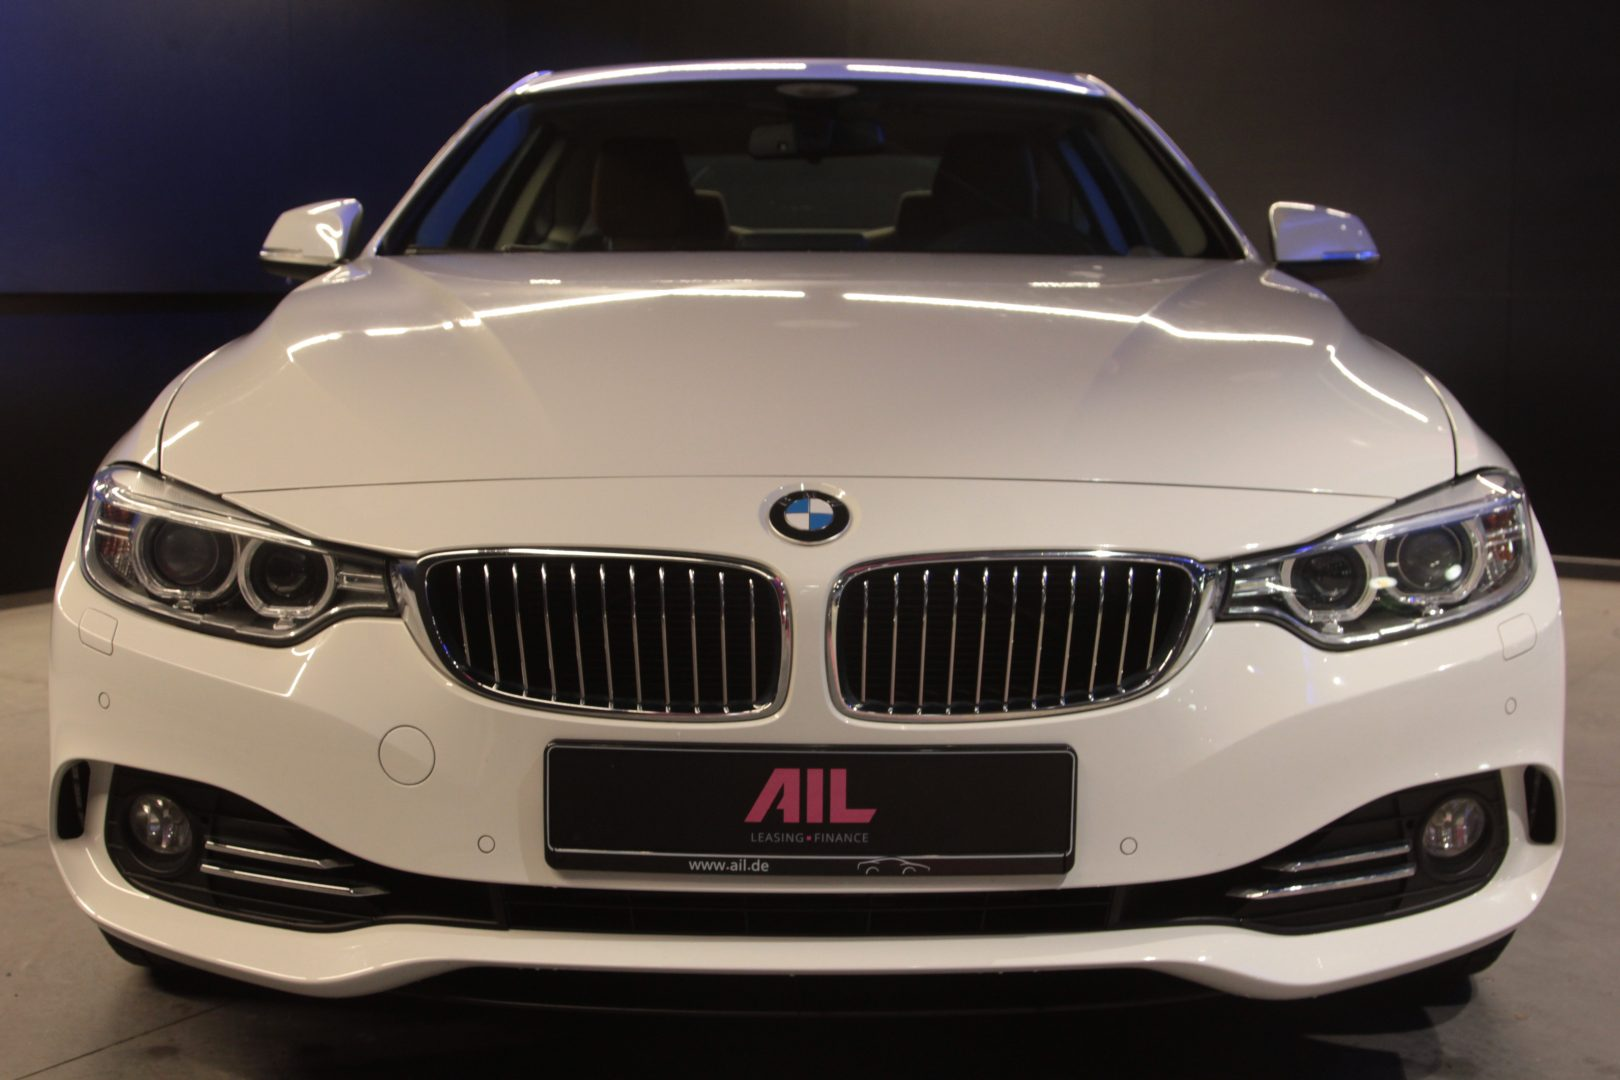 AIL BMW 430d 10